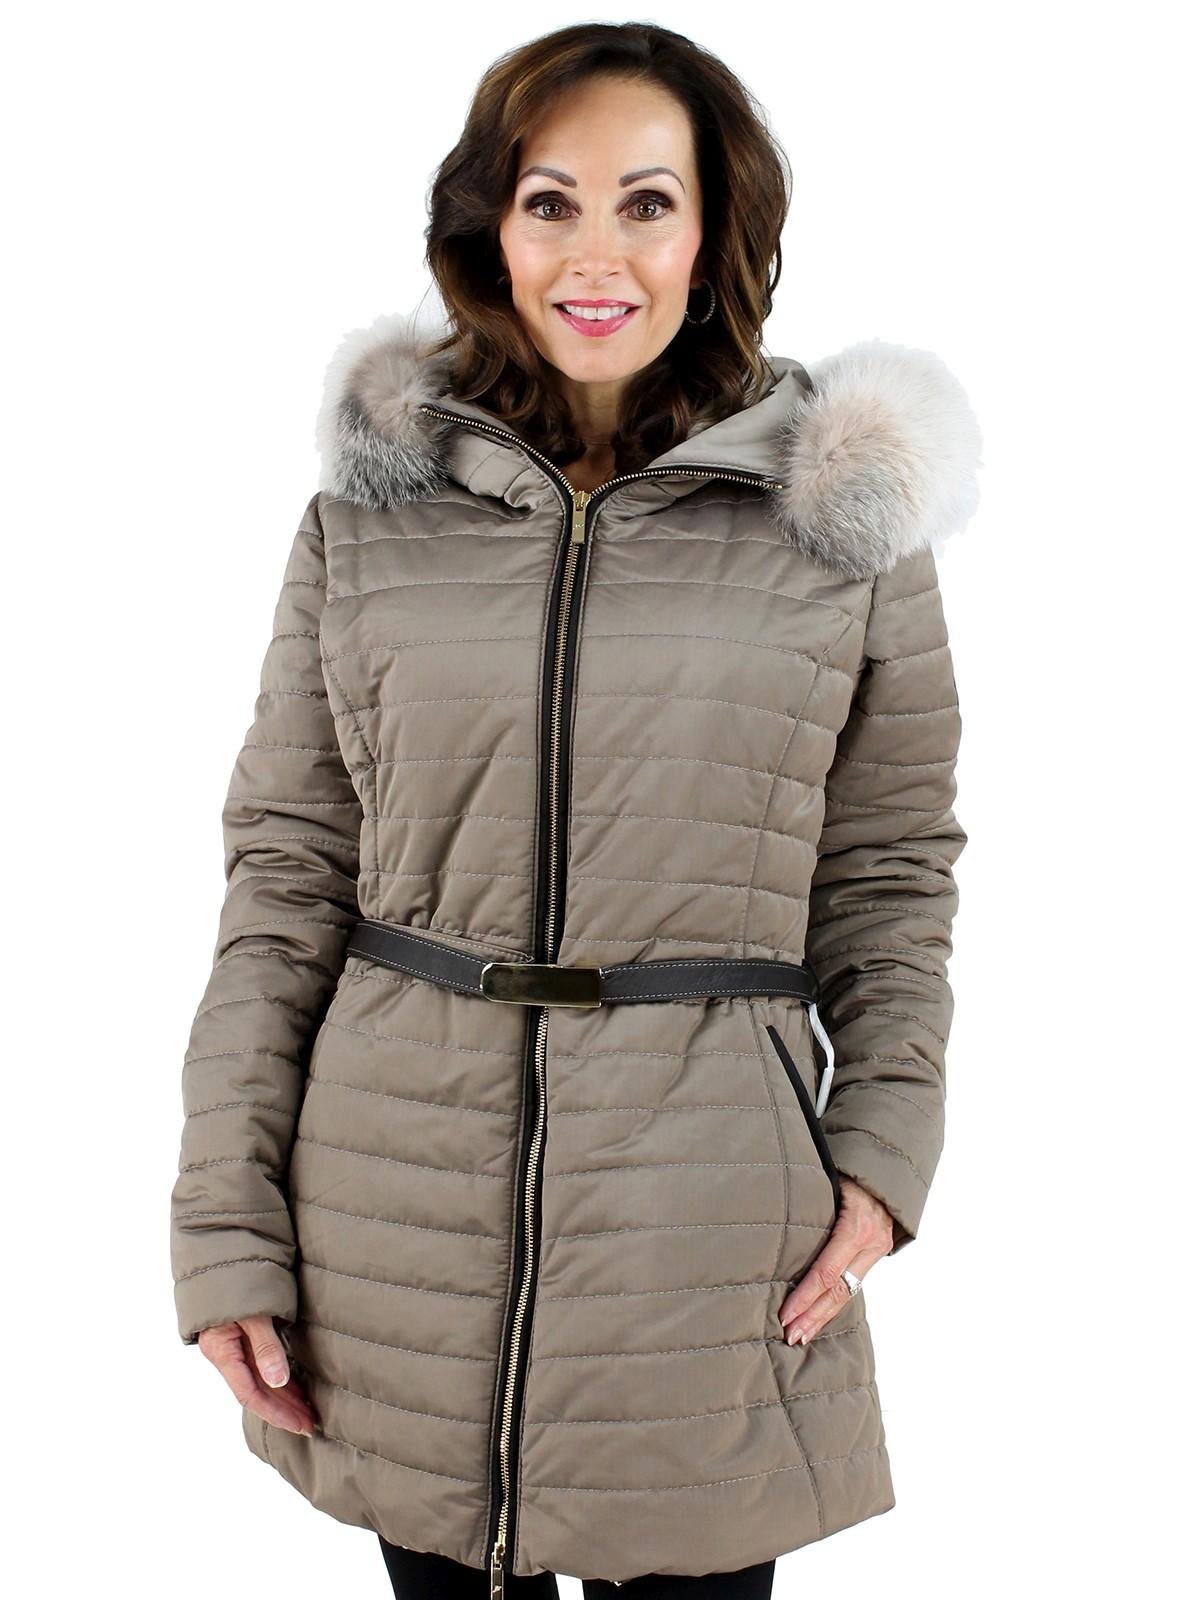 Gorski Woman's Zinco Fabric And Fox Fur Jacket